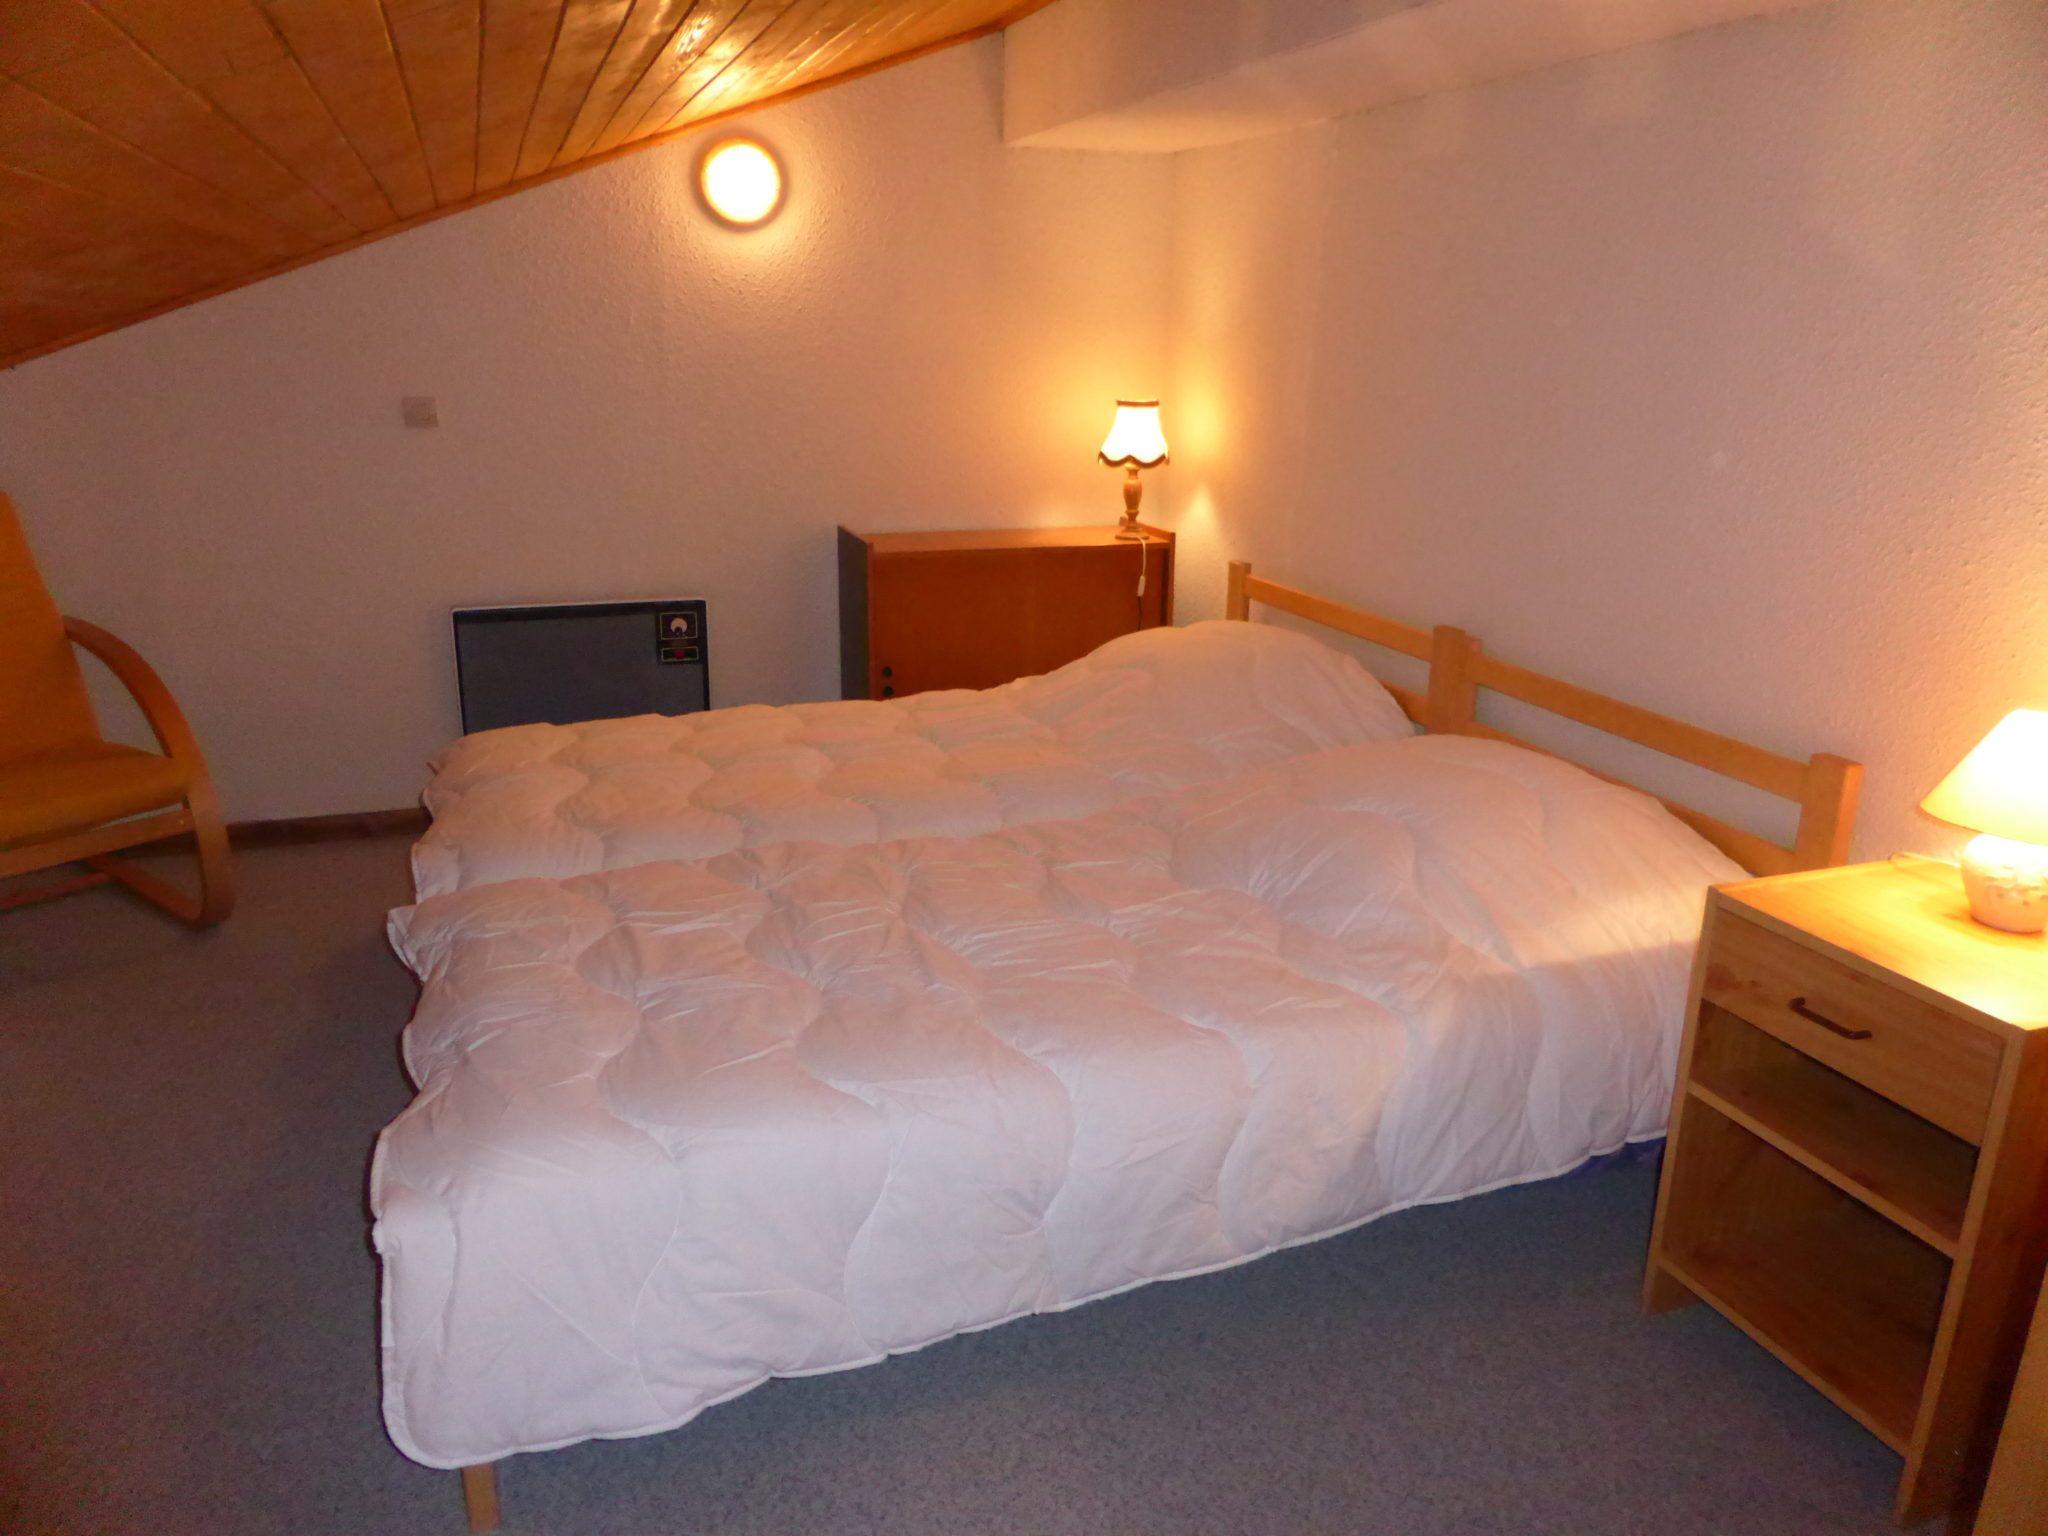 Lit Mezzanine Double Inspirant Rent 3 Rooms Contamines Schuss Vacances Mont Blanc